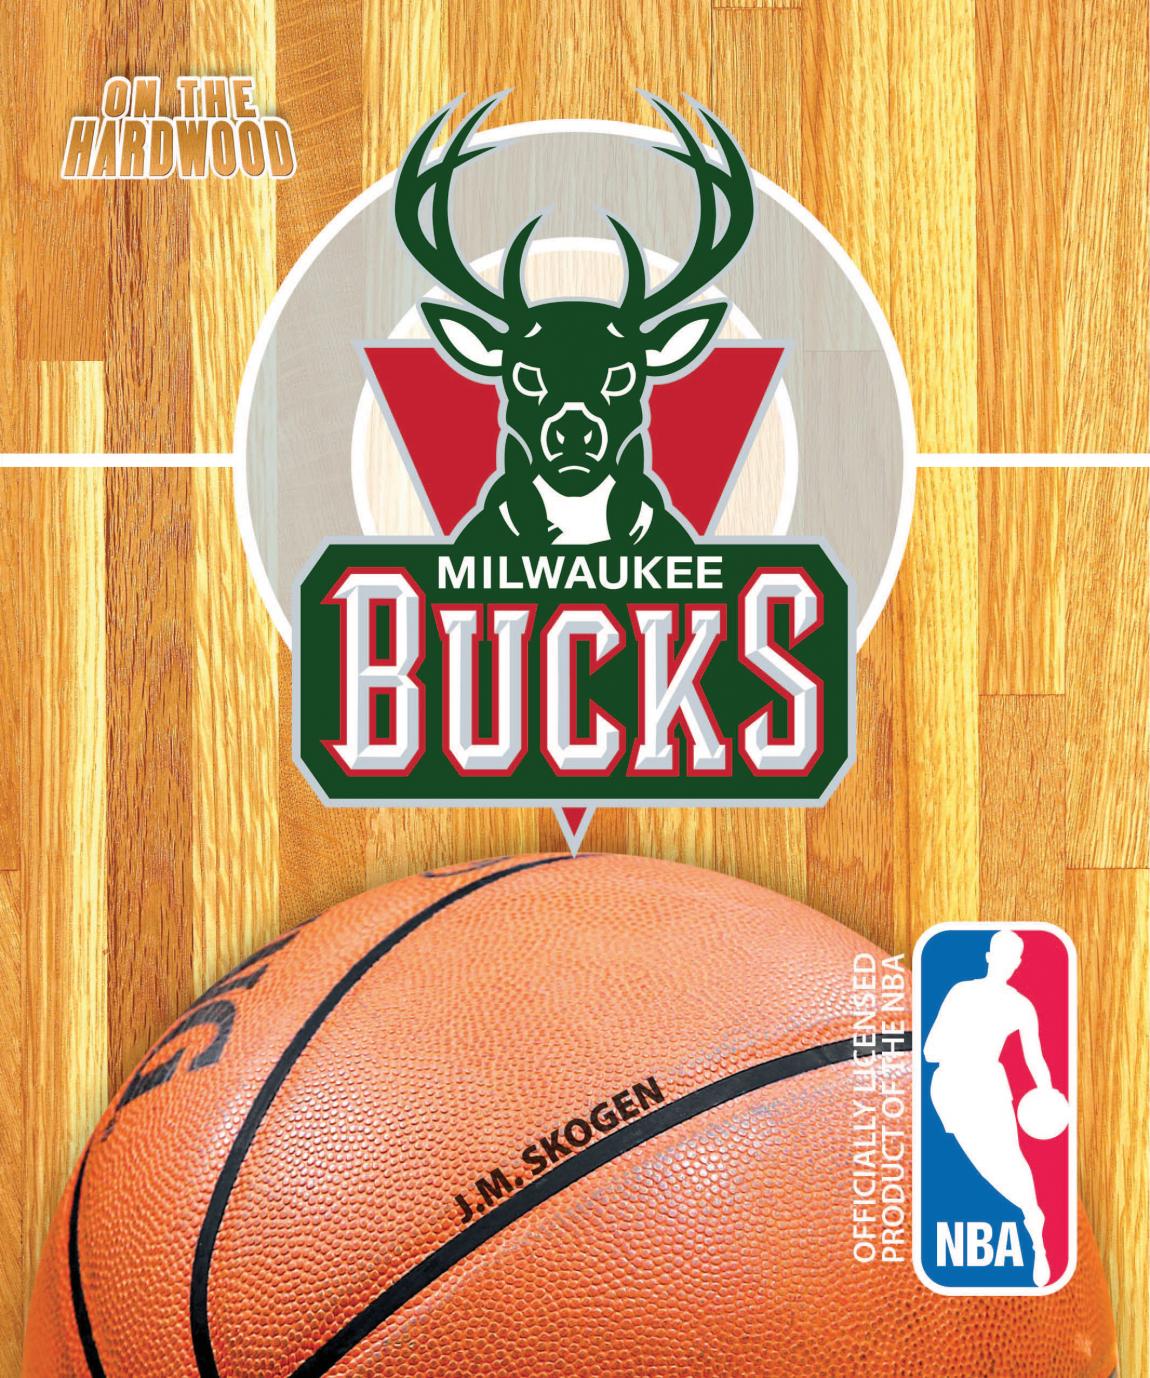 Bucks-1.png